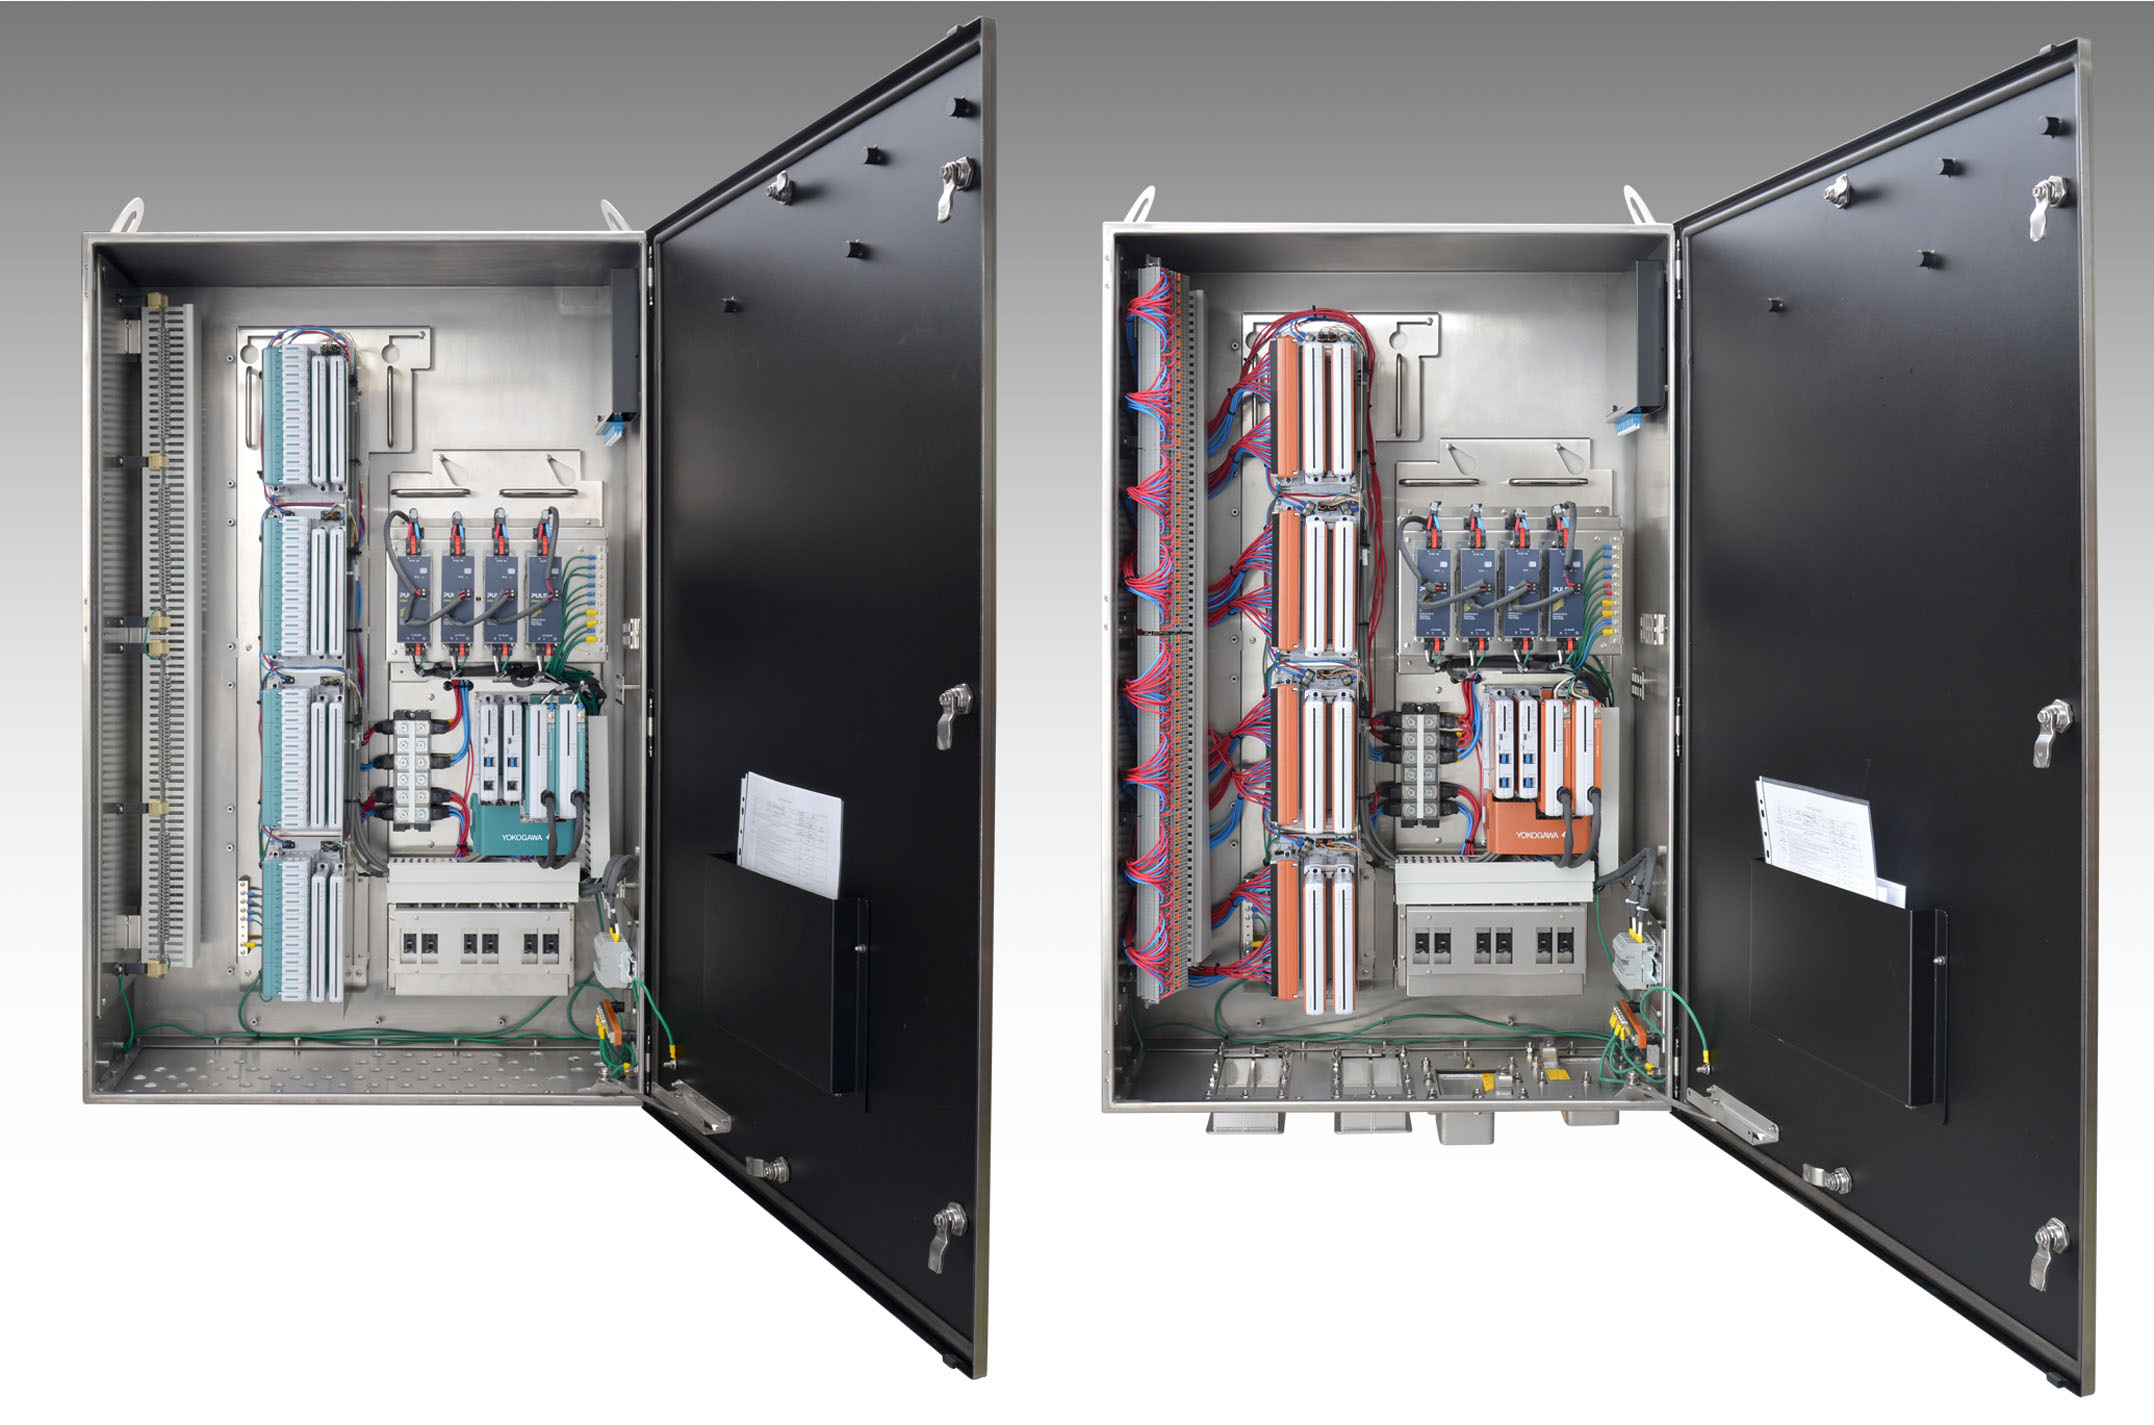 Yokogawa Develops N-IO Standard Field Enclosure and Control System ...